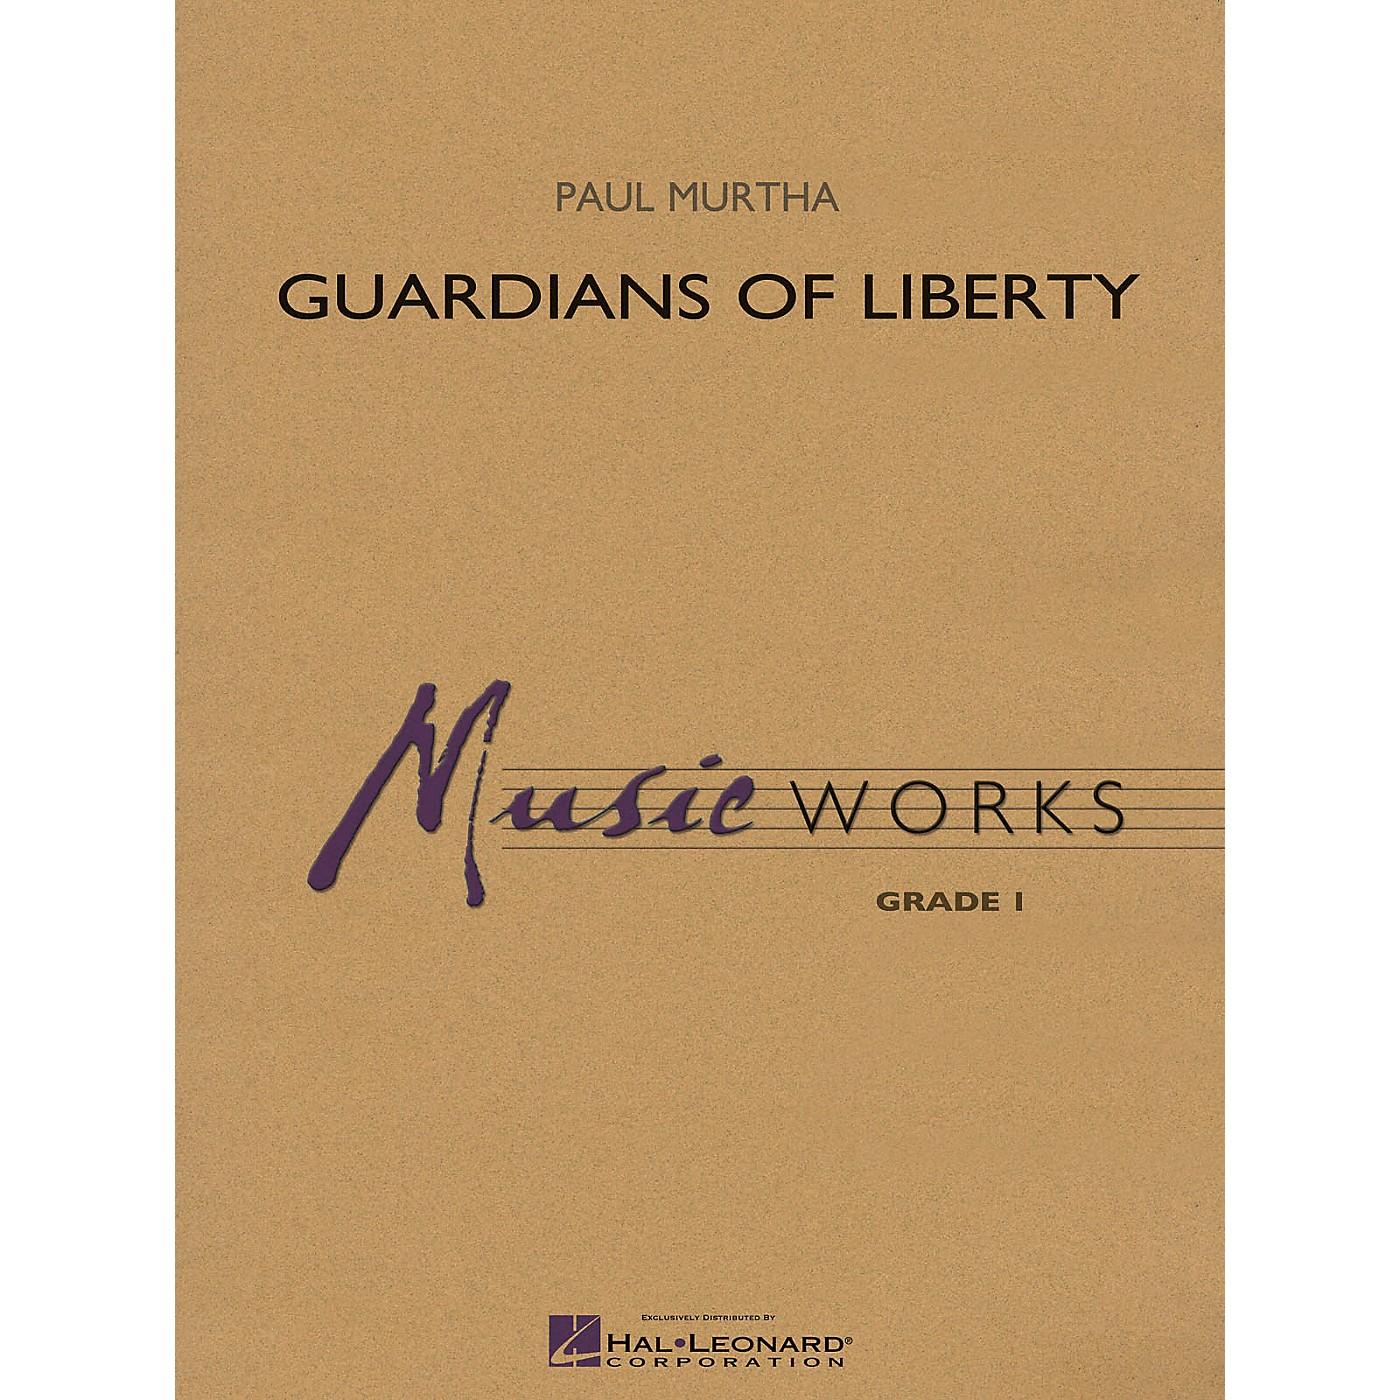 Hal Leonard Guardians of Liberty Concert Band Level 1.5 Arranged by Paul Murtha thumbnail